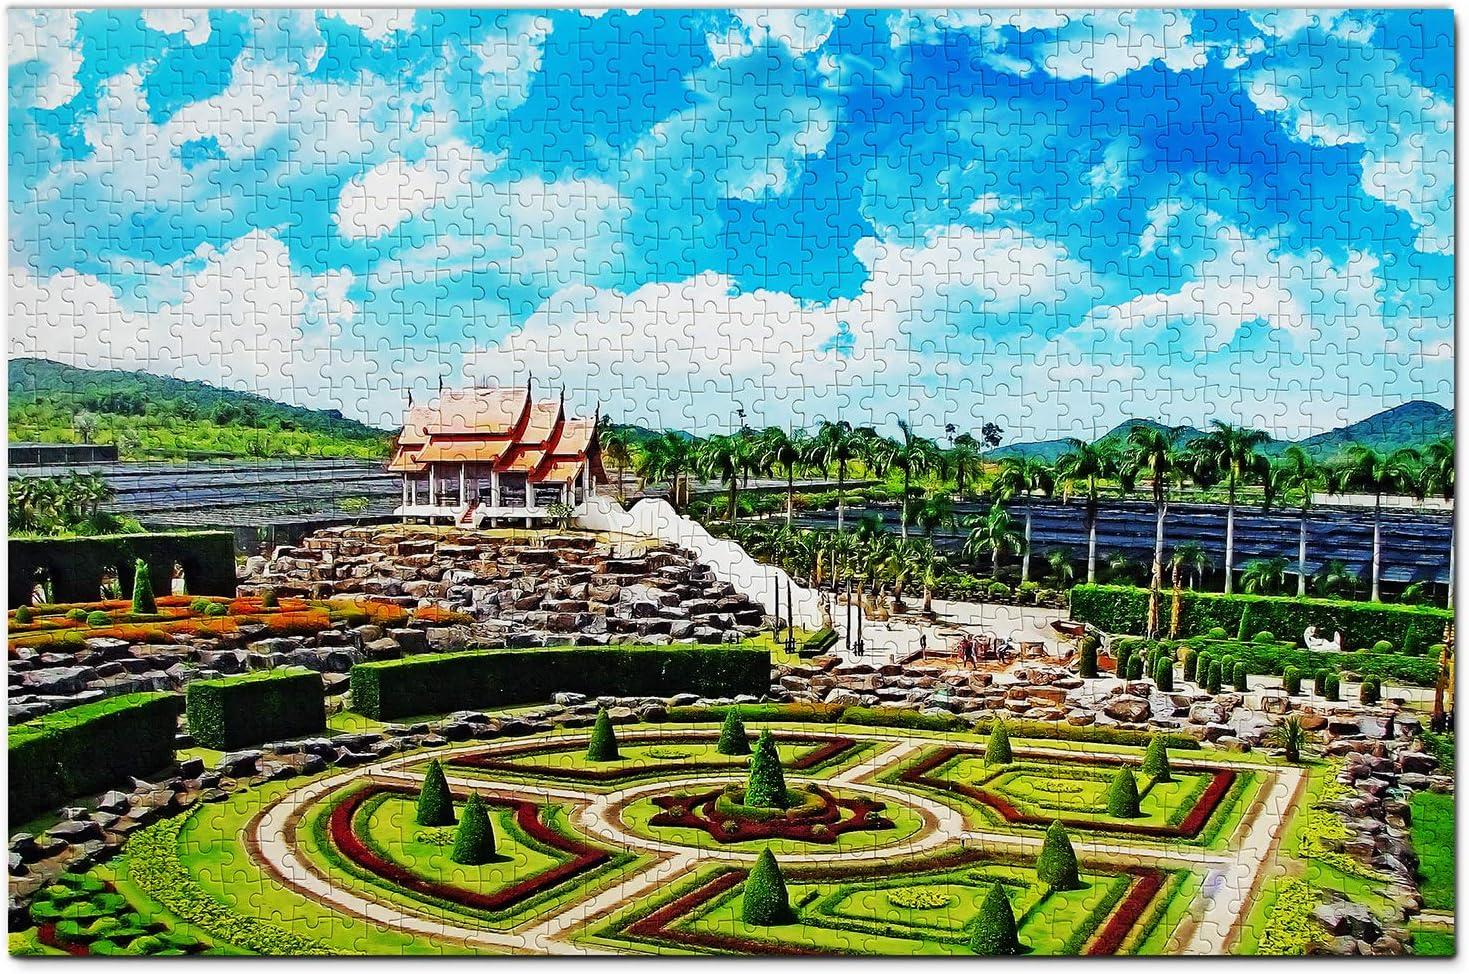 Thailand Jigsaw Puzzle 1000 Piece Thailand Nong Nooch Tropical Botanical Garden Pattaya Puzzle Game Artwork Travel Souvenir Wooden